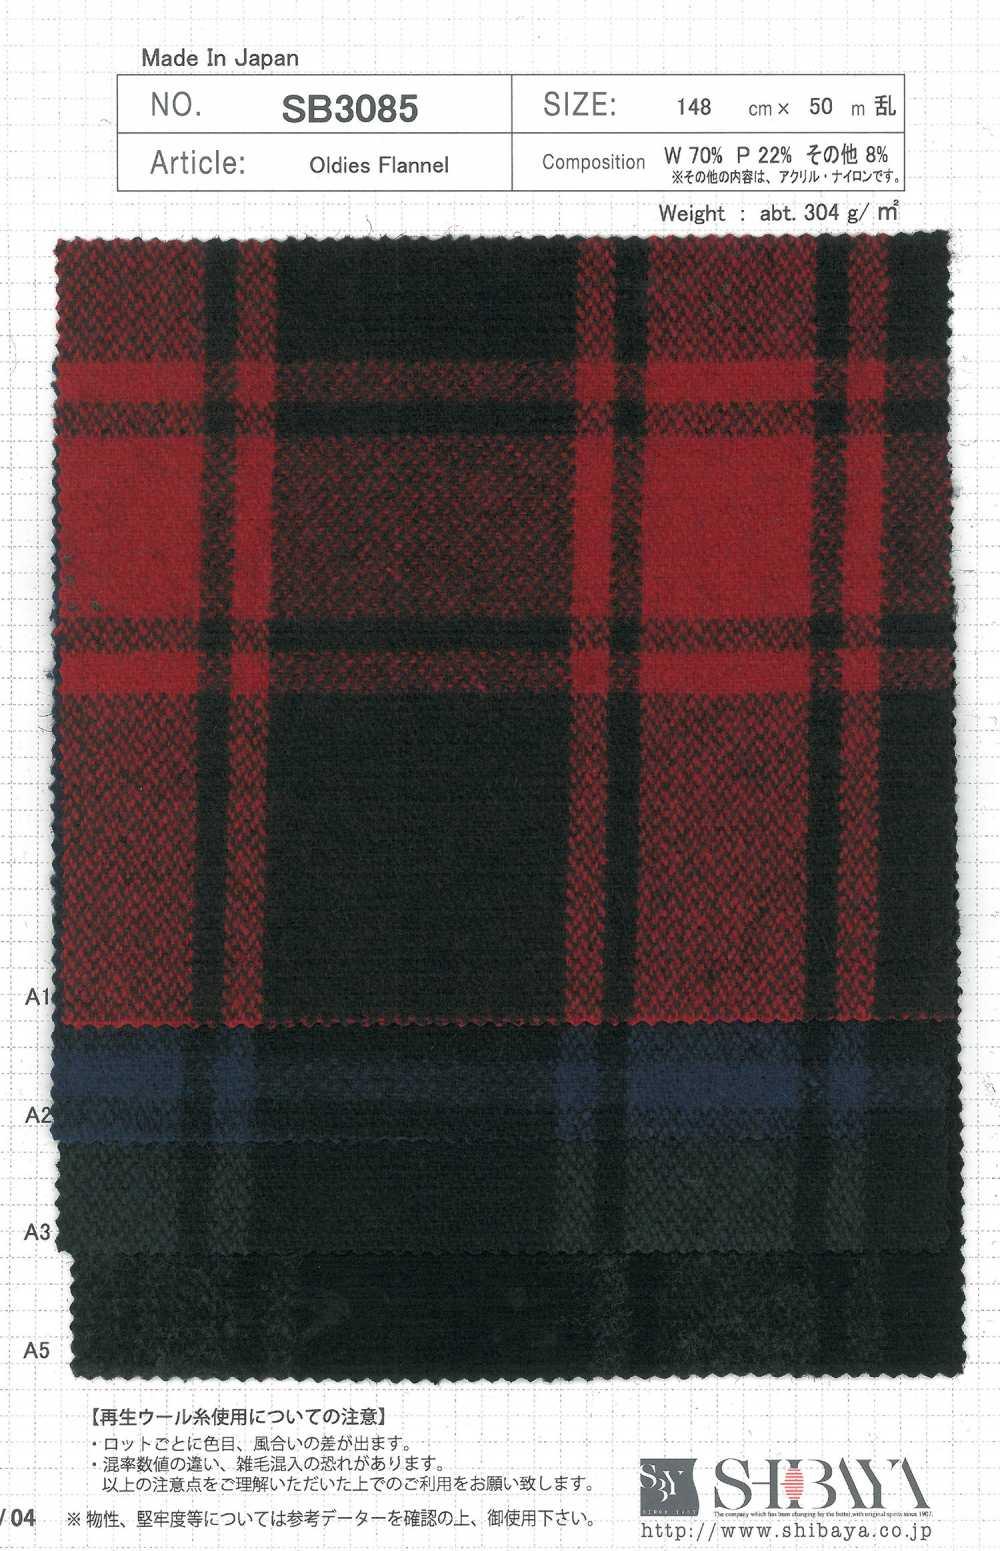 SB3085 Oldies Flannel[生地] 柴屋/オークラ商事 - ApparelX アパレル資材卸通販